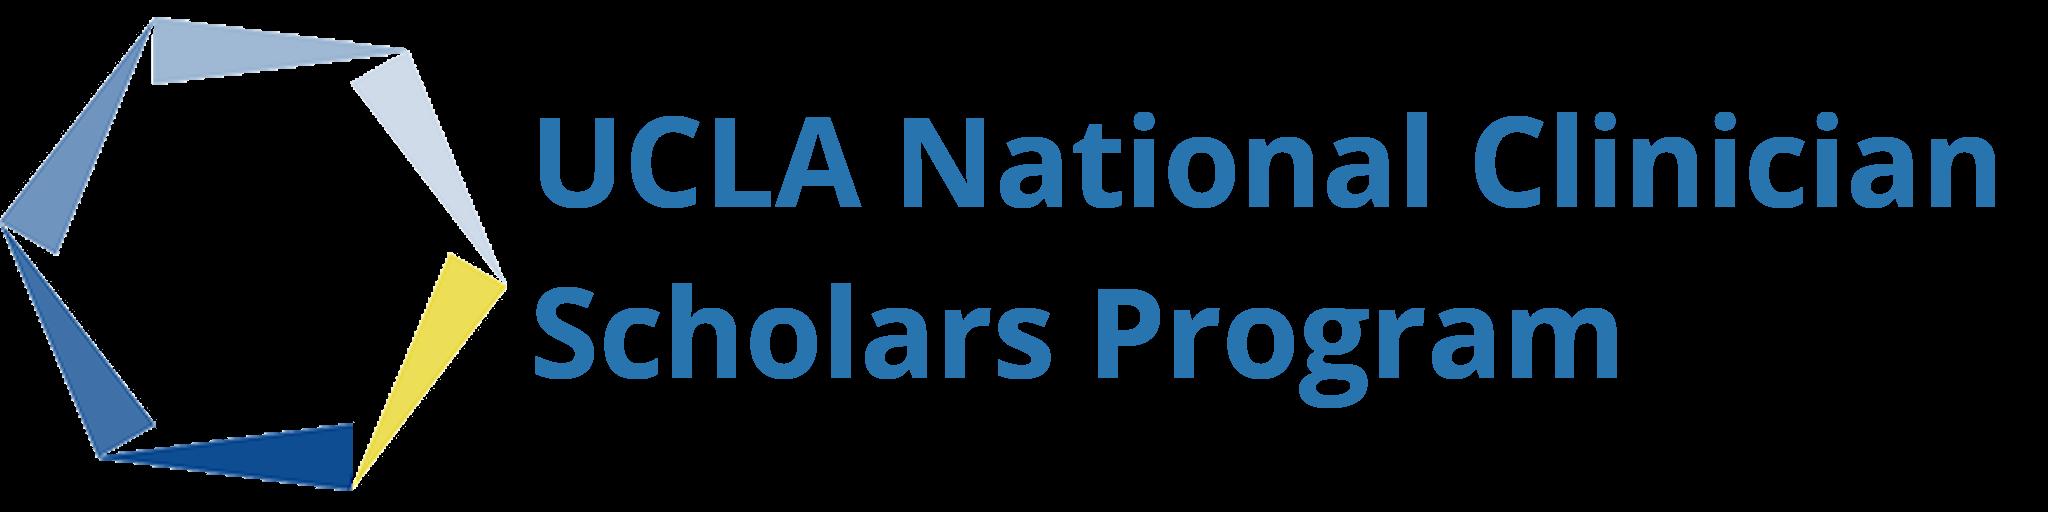 National Clinician Scholars Program at UCLA